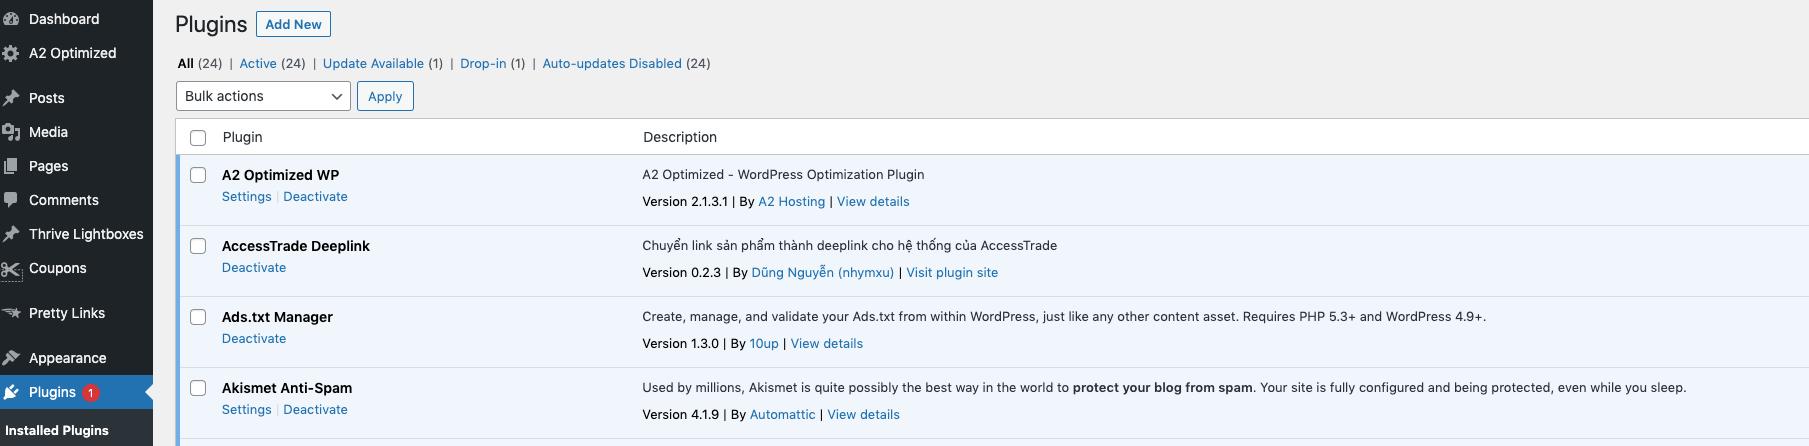 plugin trong wordpress admin